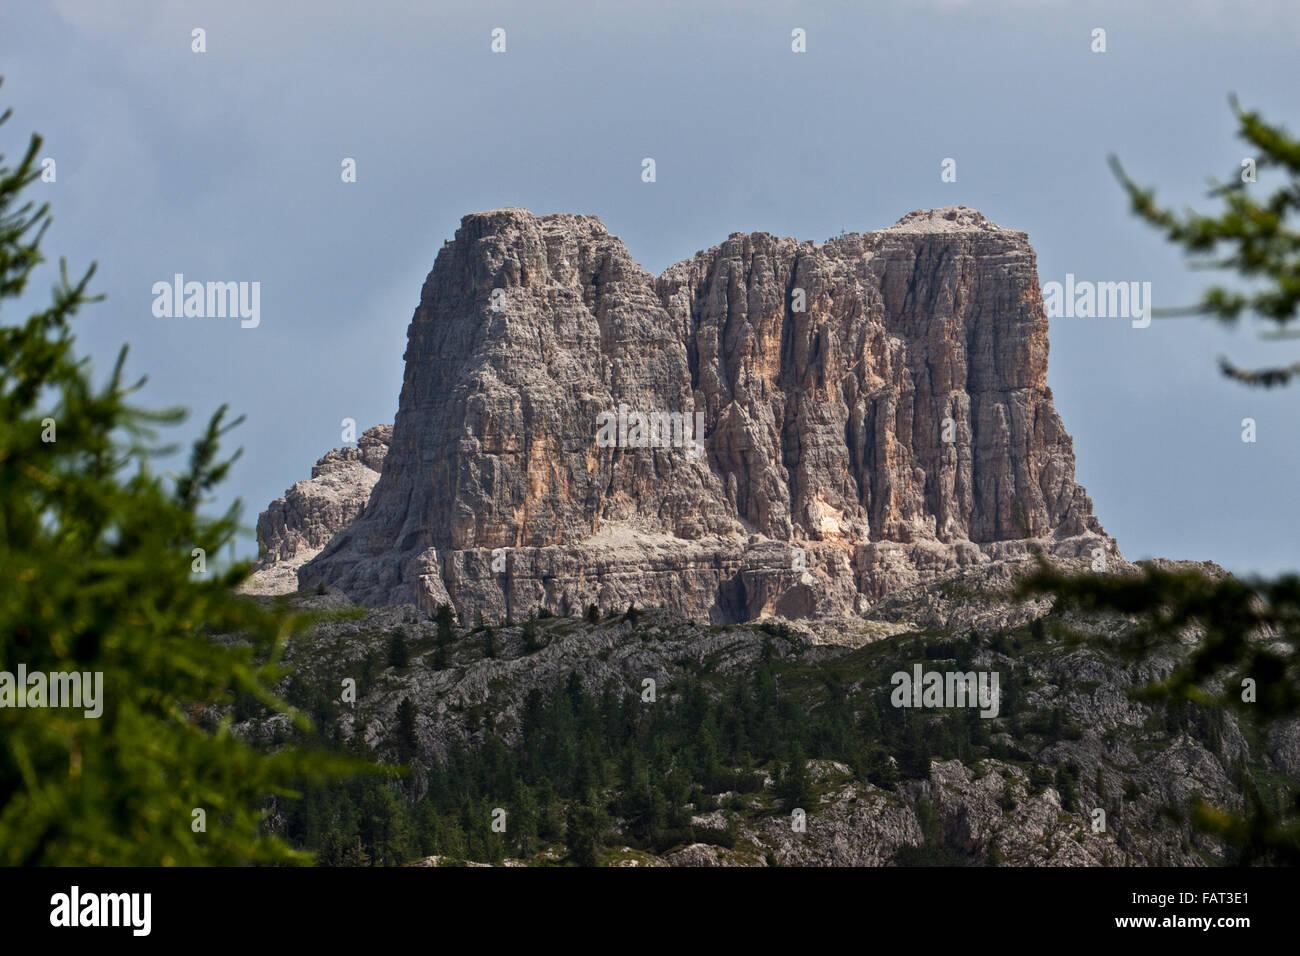 Mount Averau as seen from the Falzarego Pass, near Cortina d'Ampezzo, Italy - Stock Image